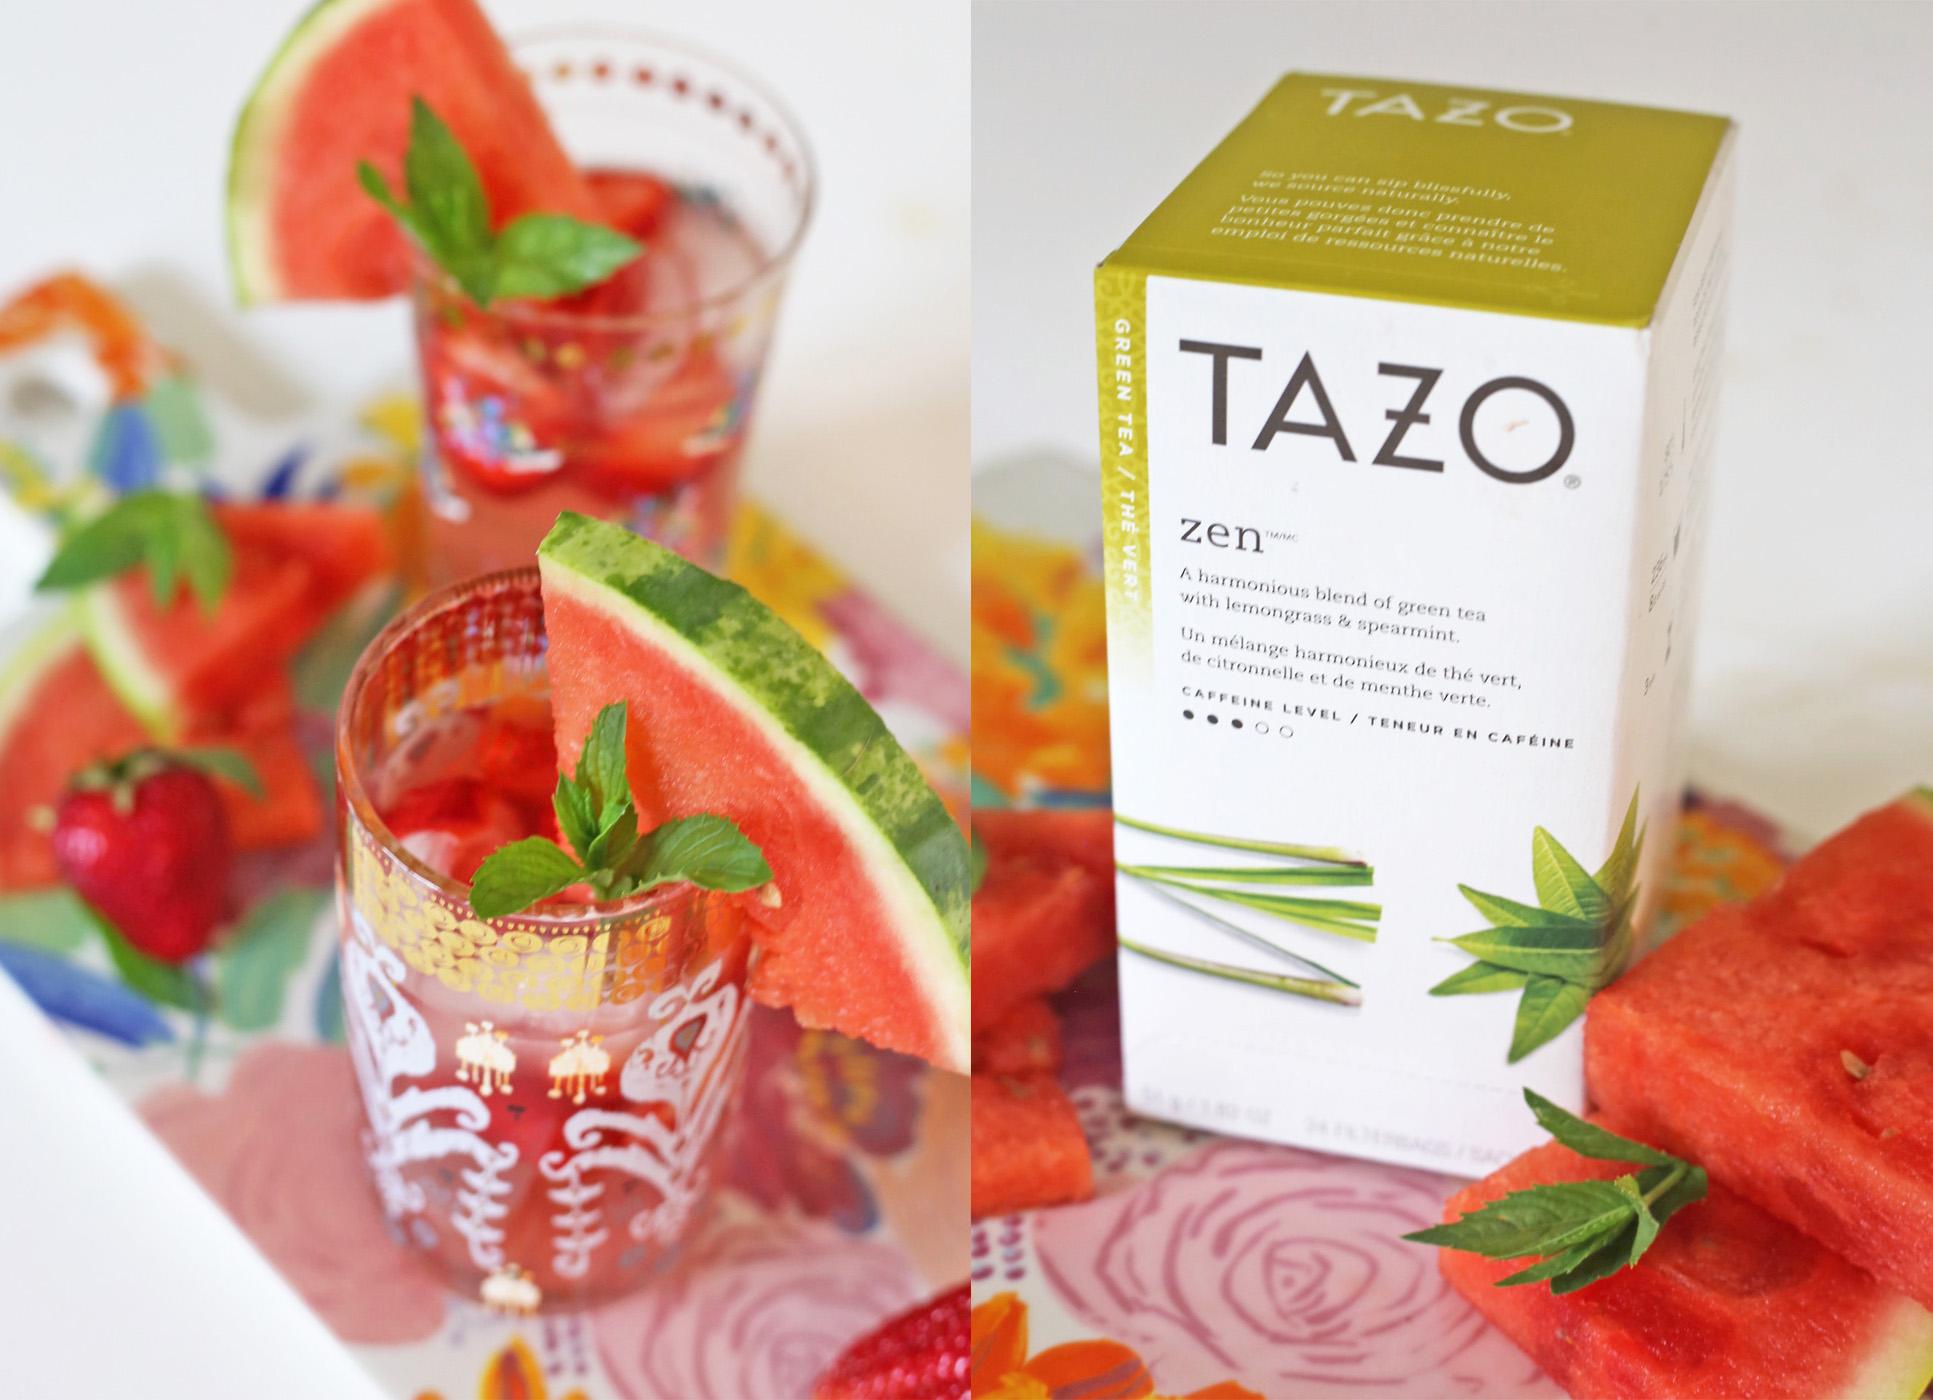 summer drink ideas | watermelon iced tea | Tazo tea |  drink recipe | Mash Elle lifestyle